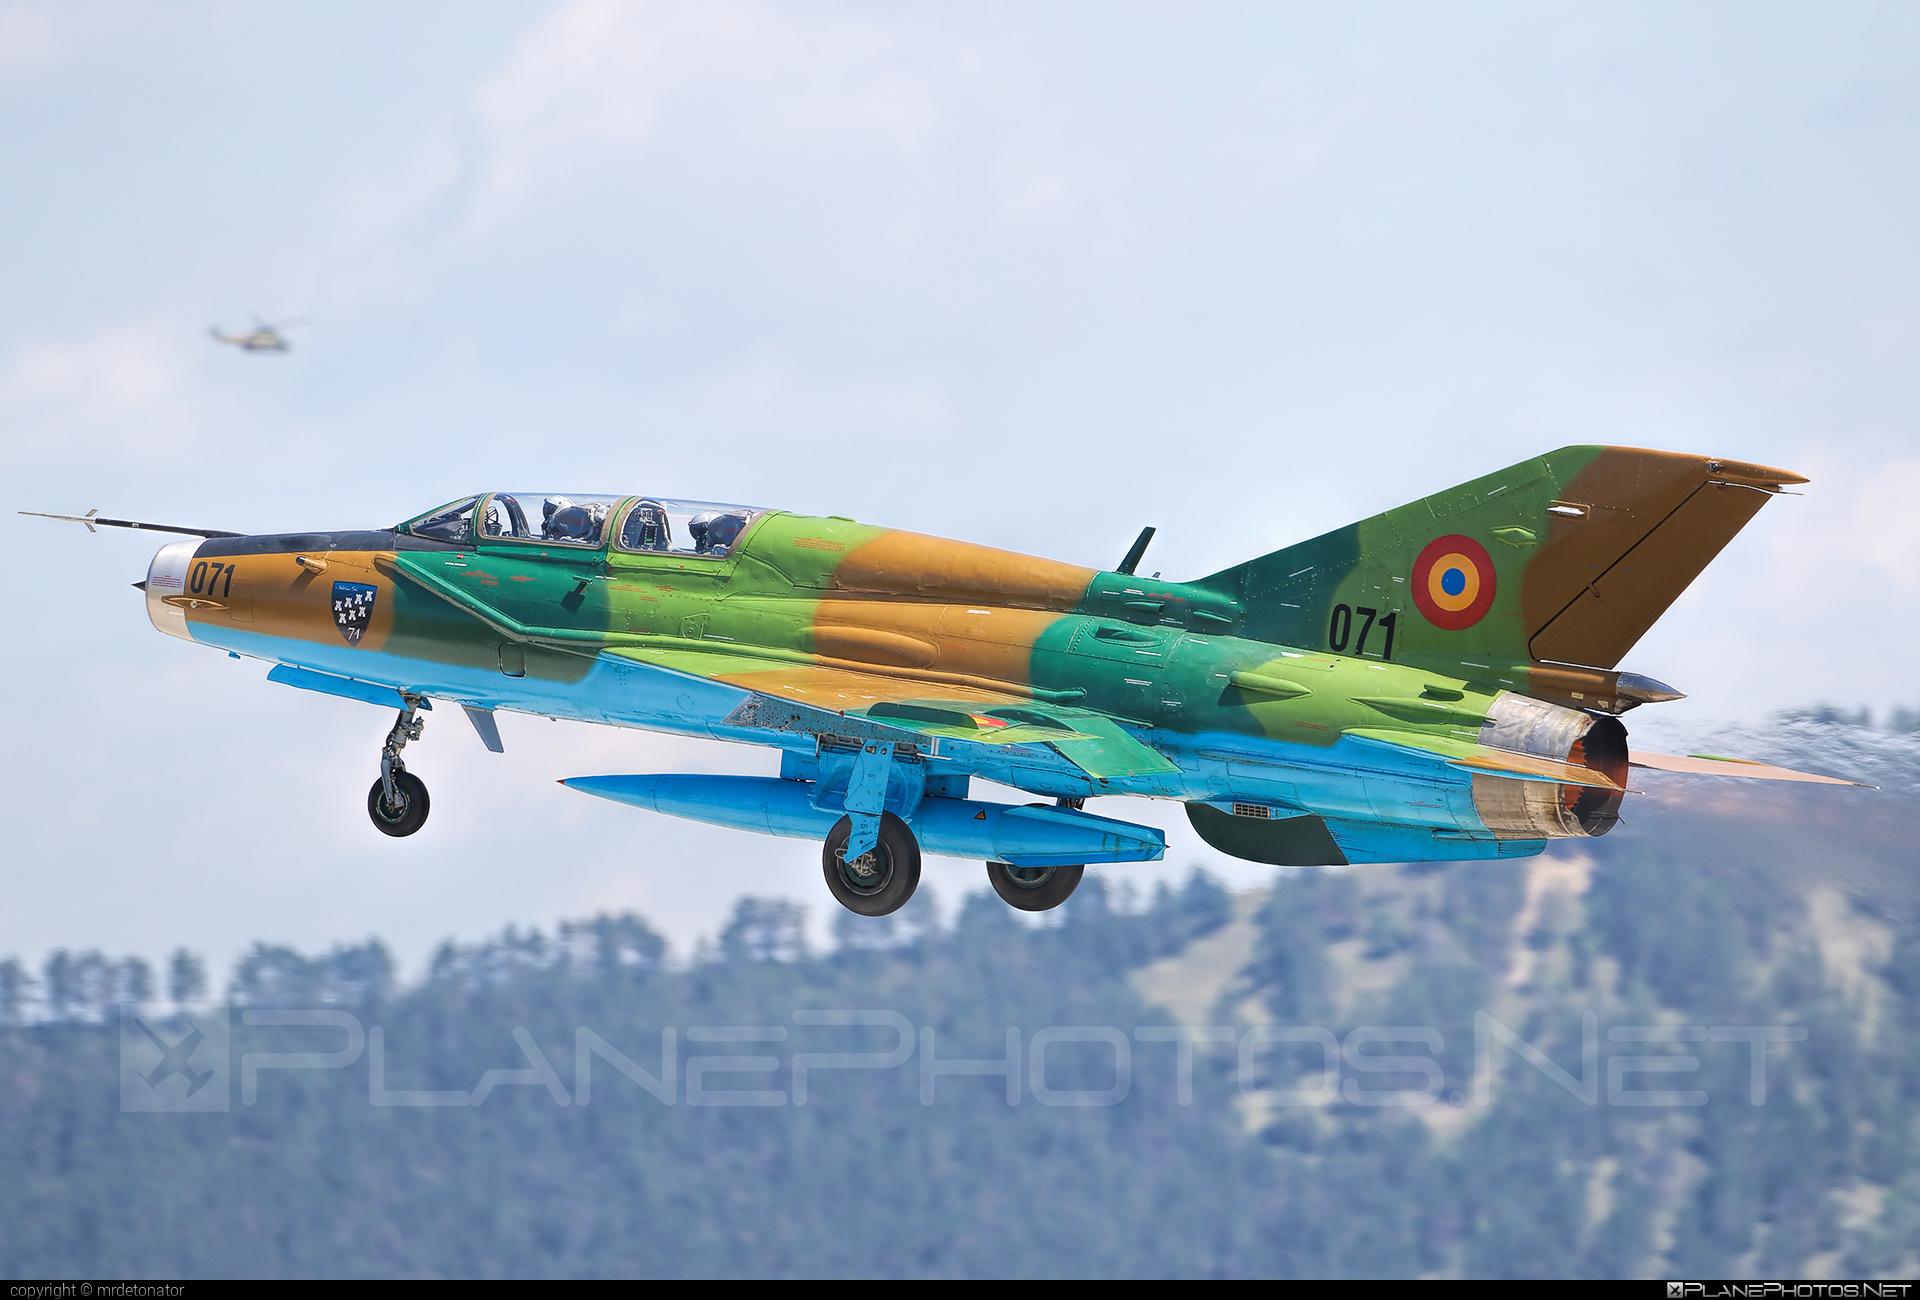 Mikoyan-Gurevich MiG-21UM - 071 operated by Forţele Aeriene Române (Romanian Air Force) #forteleaerieneromane #mig #mig21 #mig21um #mikoyangurevich #romanianairforce